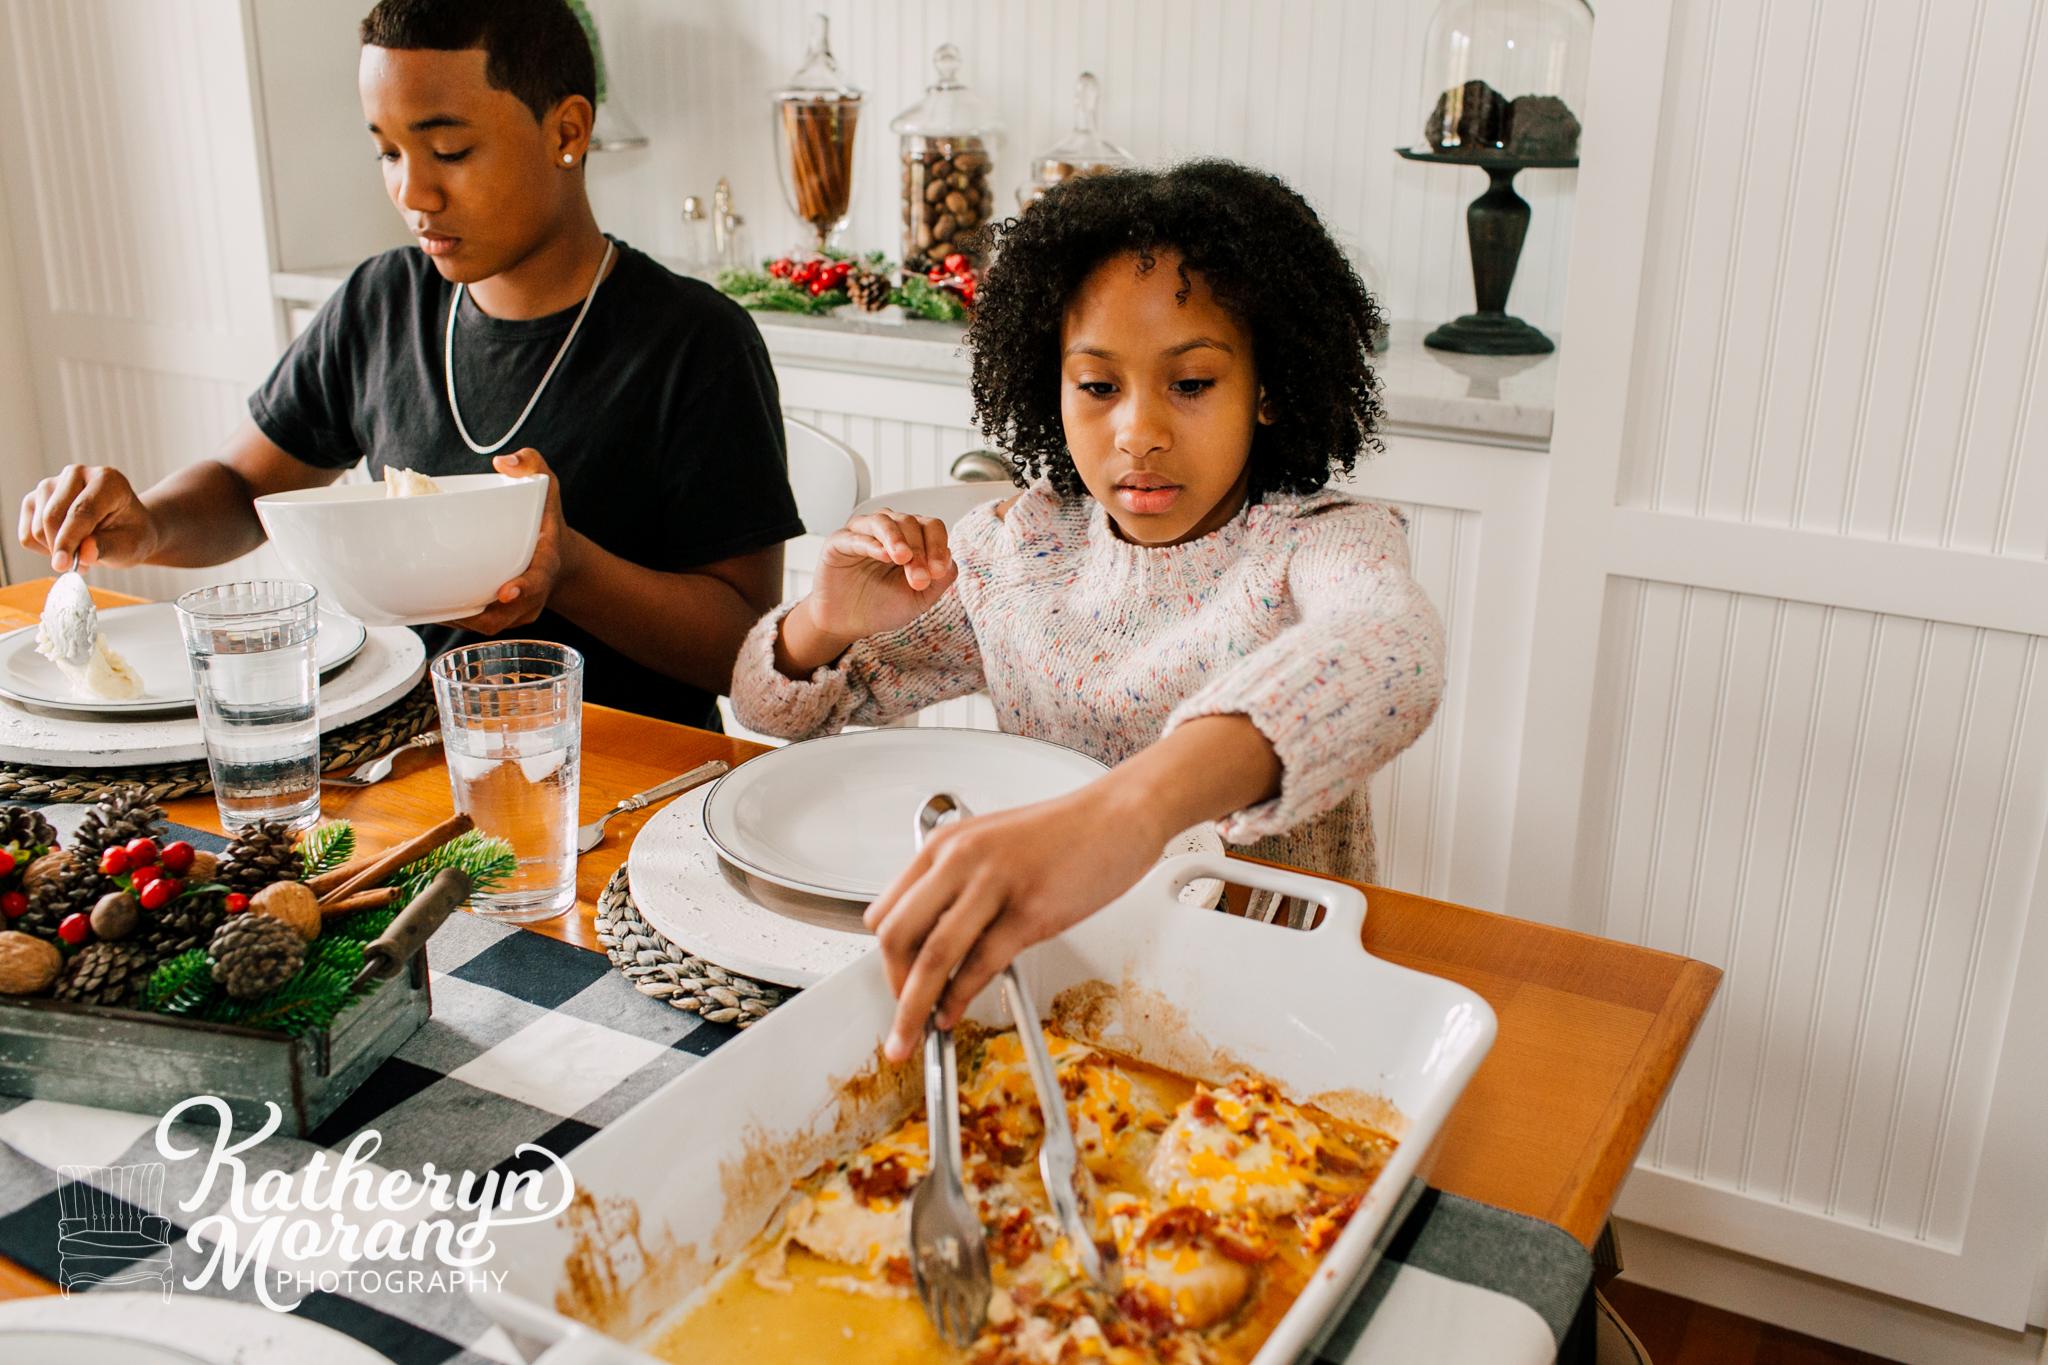 dream-dinners-lifestyle-session-katheryn-moran-2019-20.jpg